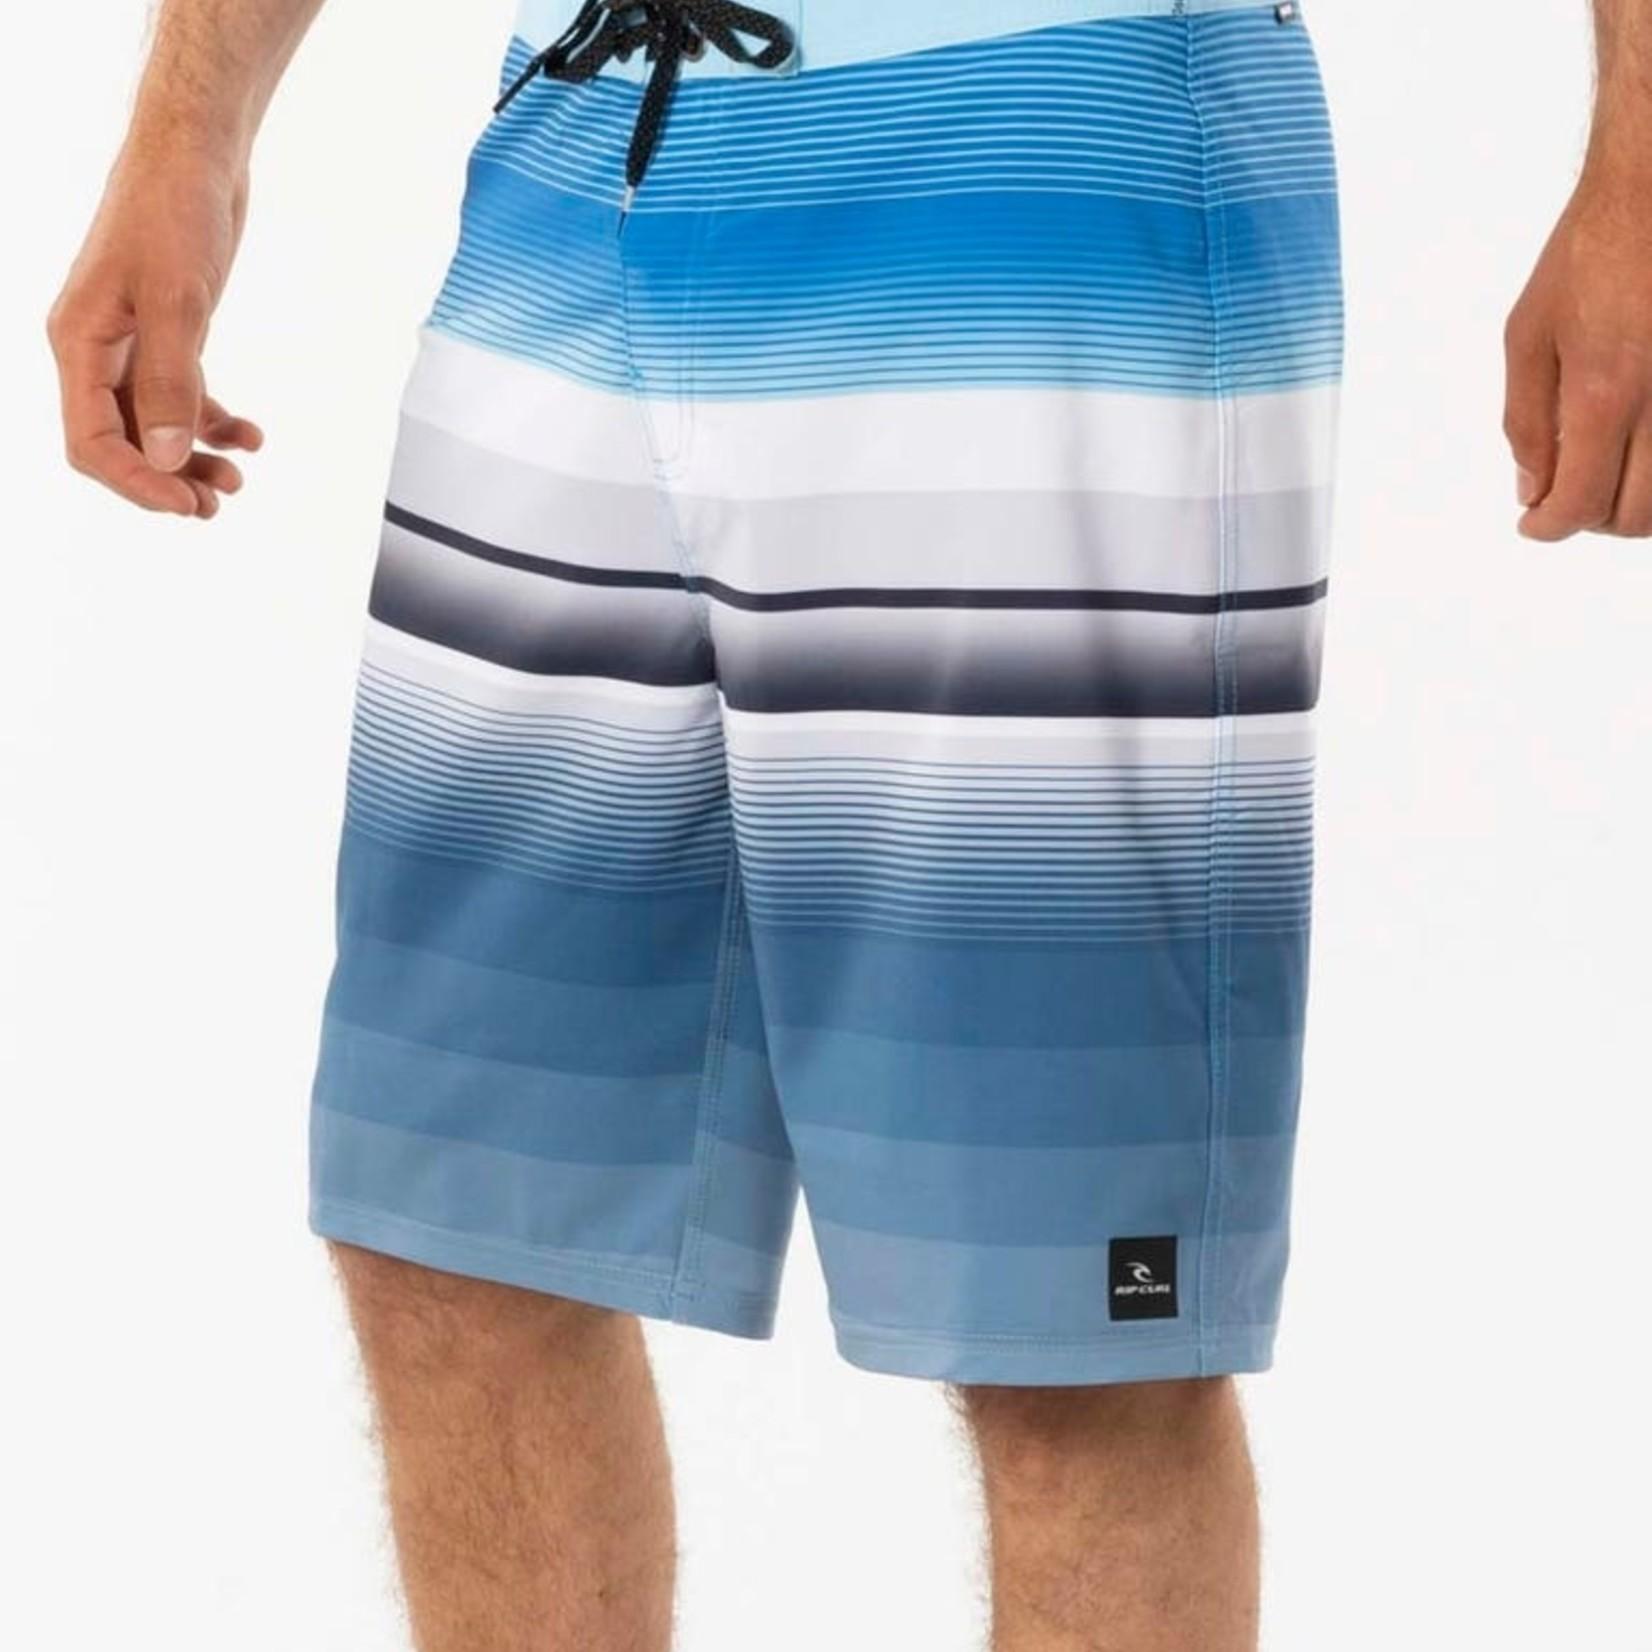 RipCurl Rip Curl Mirage Daybreak Boardshorts